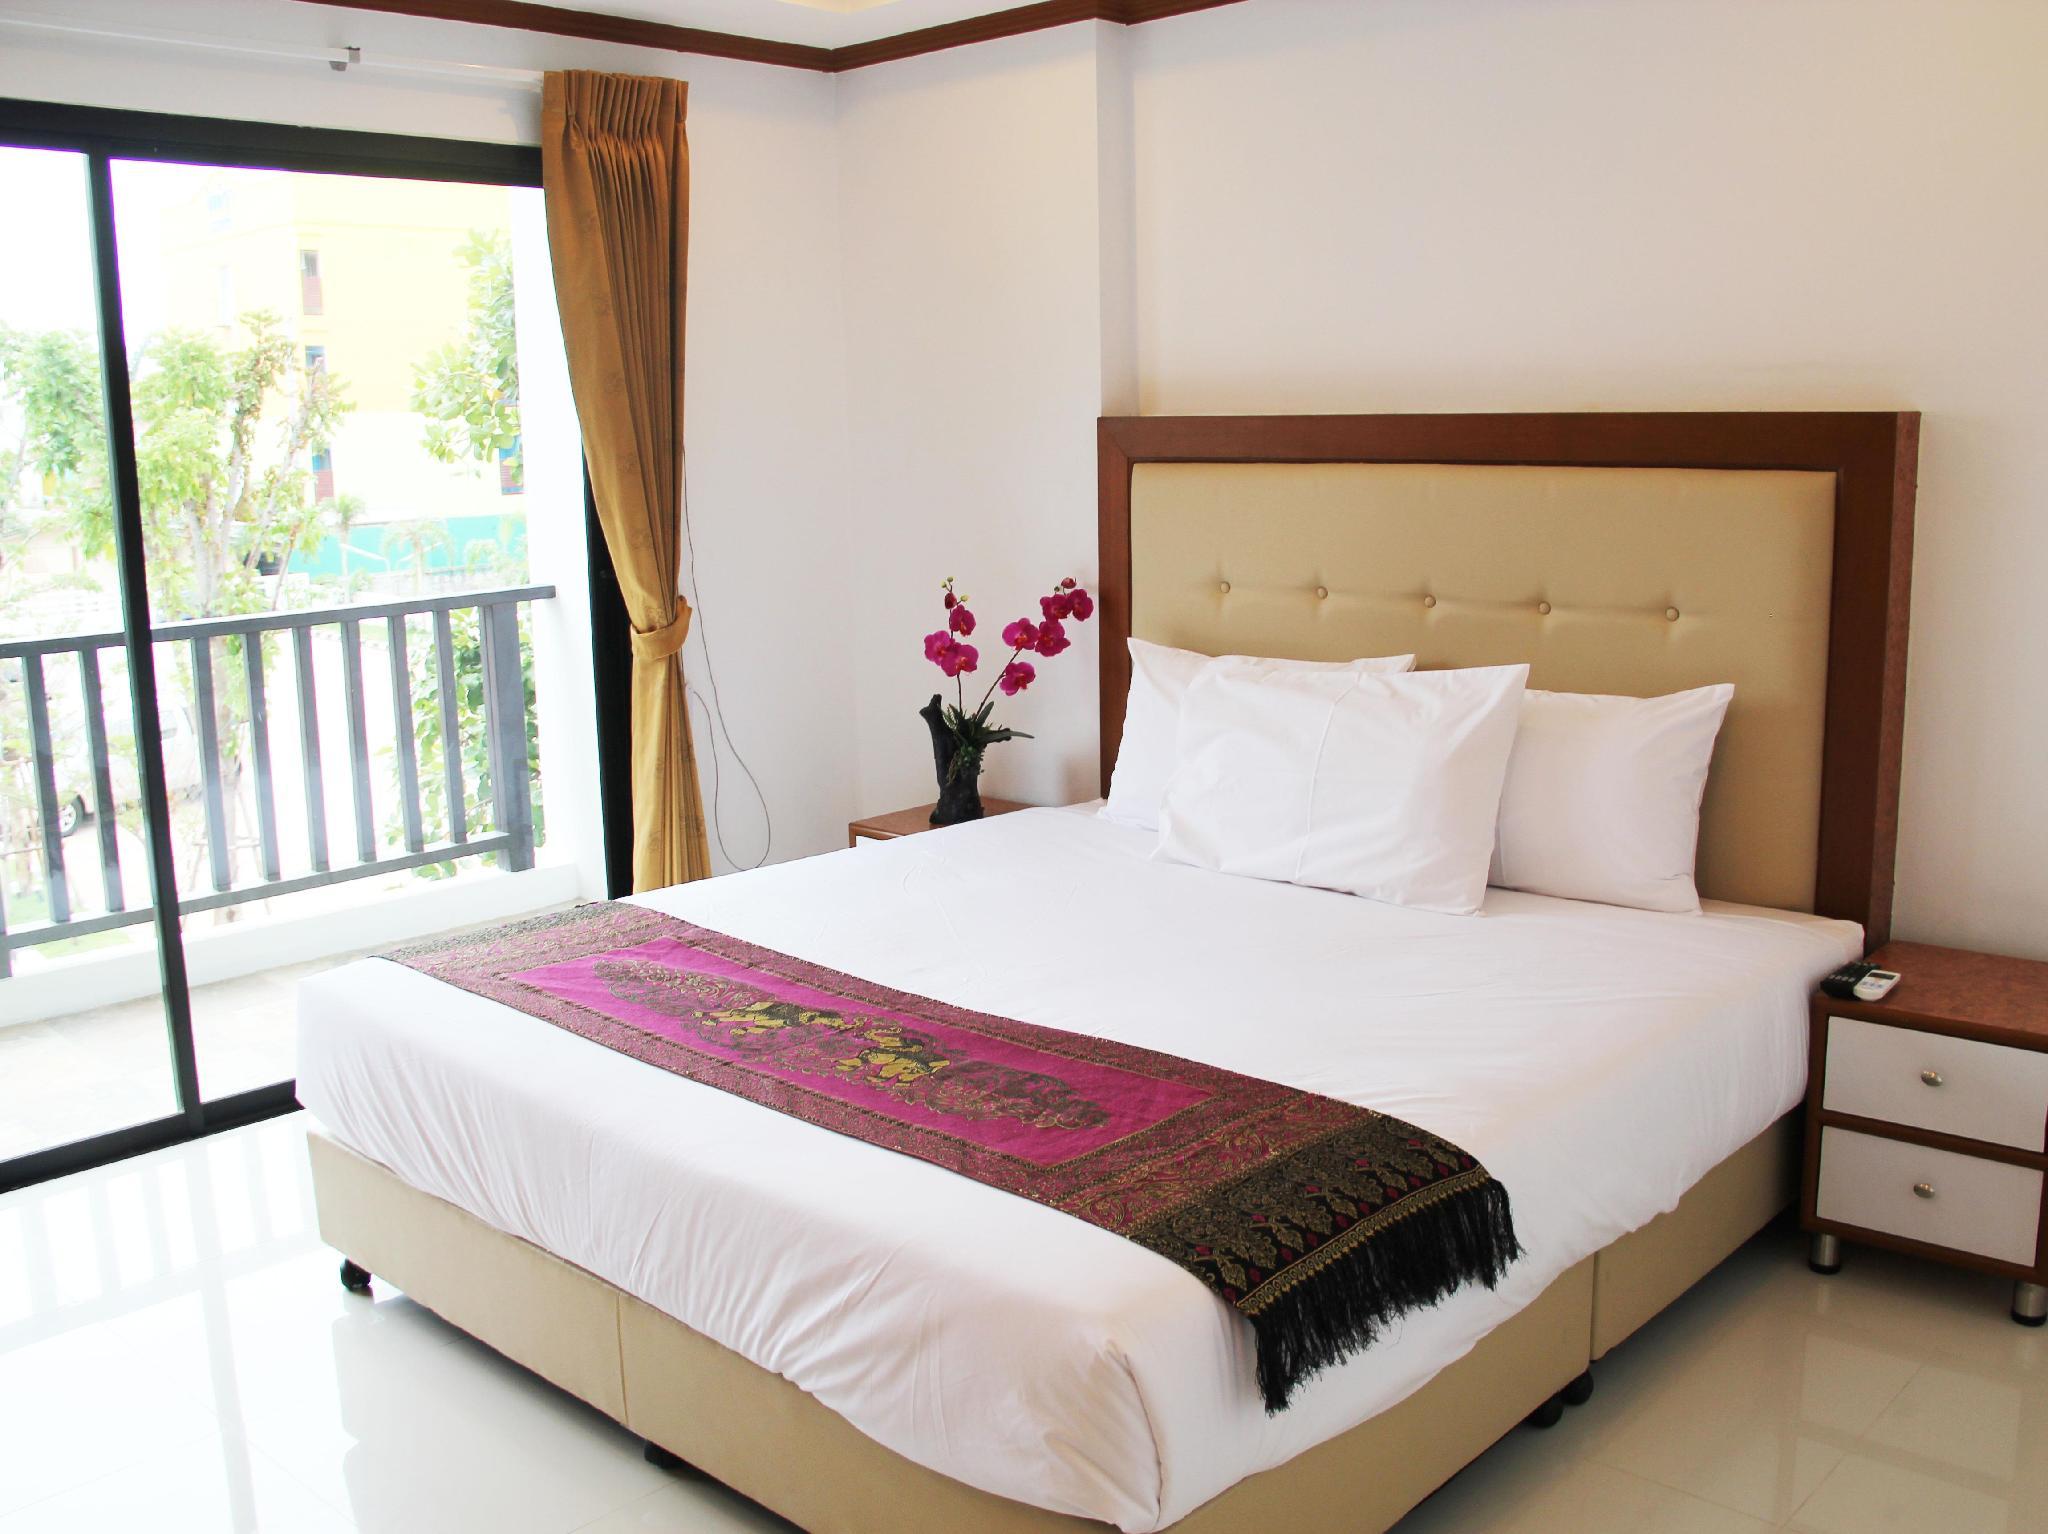 Mammoth Resort,แมมมอธ รีสอร์ท ขอนแก่น